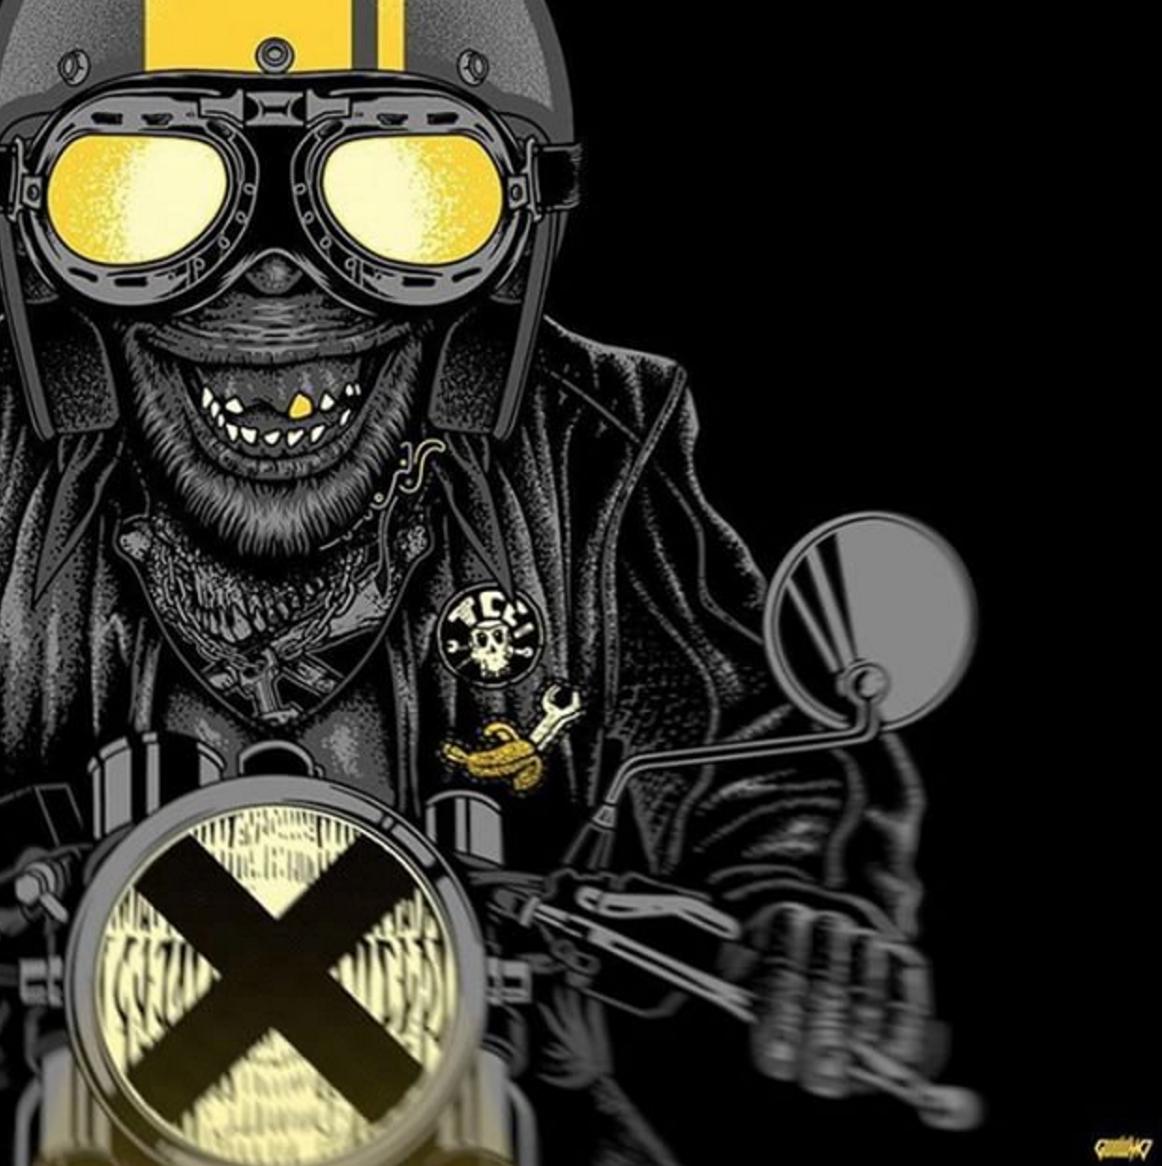 cafe racer motorcycle badass bike cool pasion awesome profile really badasshelmetstore moto monkey